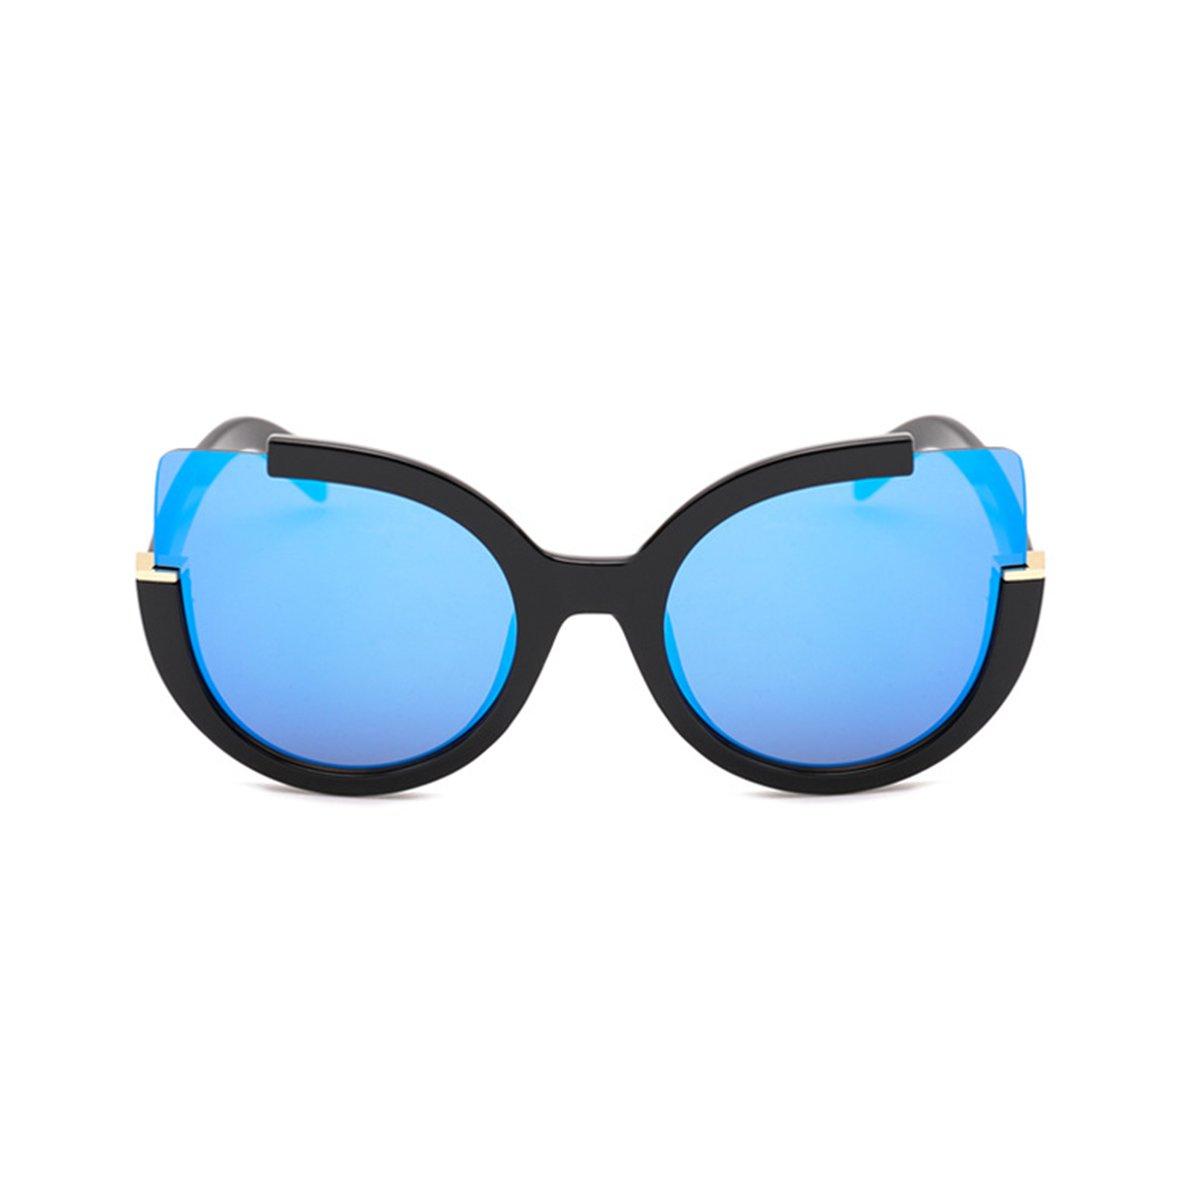 21a812ea0 Amazon.com: Supertrip Womens Fashion Oversized Round Square Plastic Vintage  Cut-Out Flash Mirror Lens Cat Eye Sunglasses (black-blue): Clothing